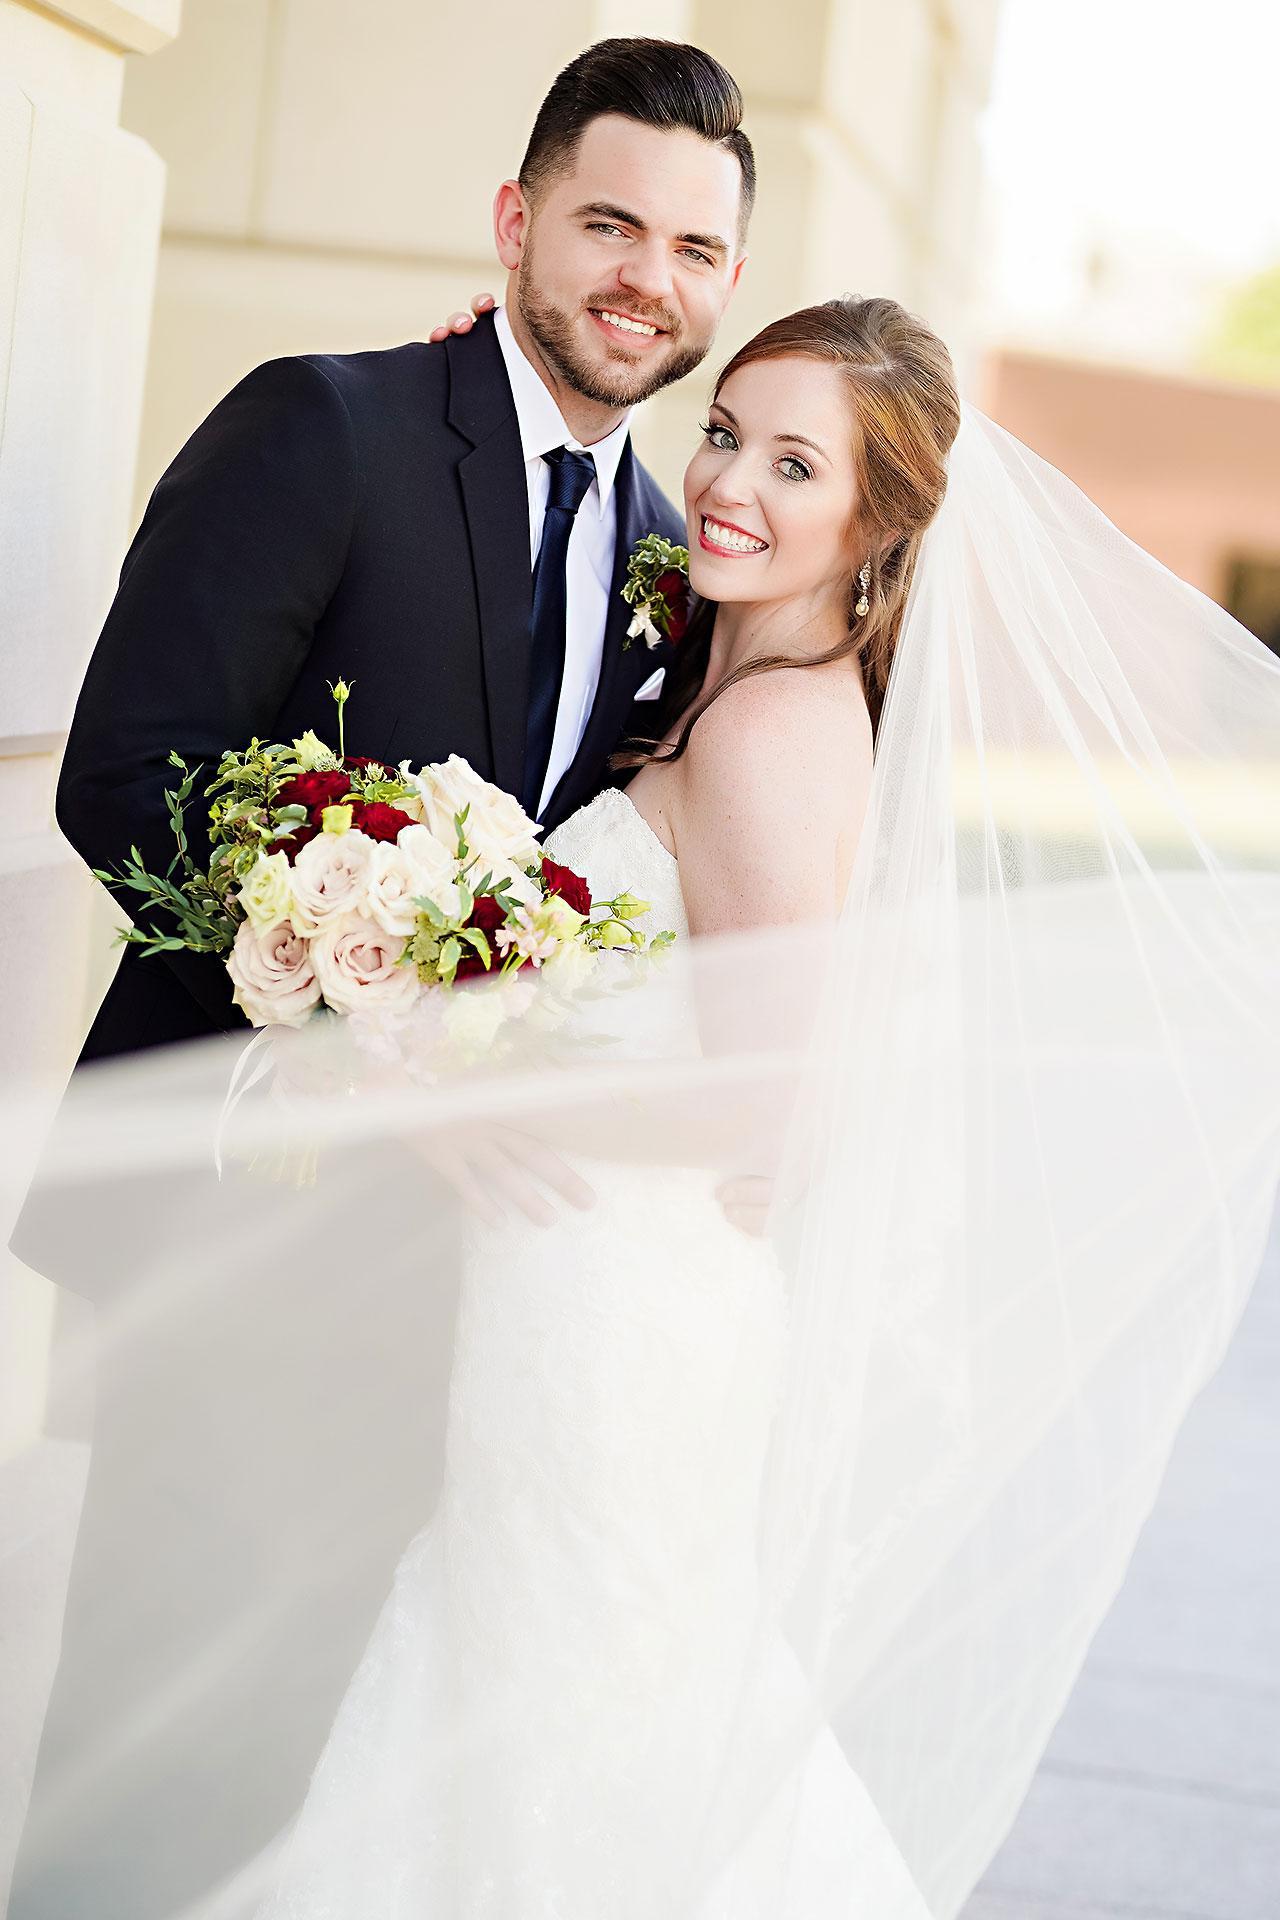 Callie Josh Ritz Charles Garden Pavilion Carmel Indiana Wedding 070